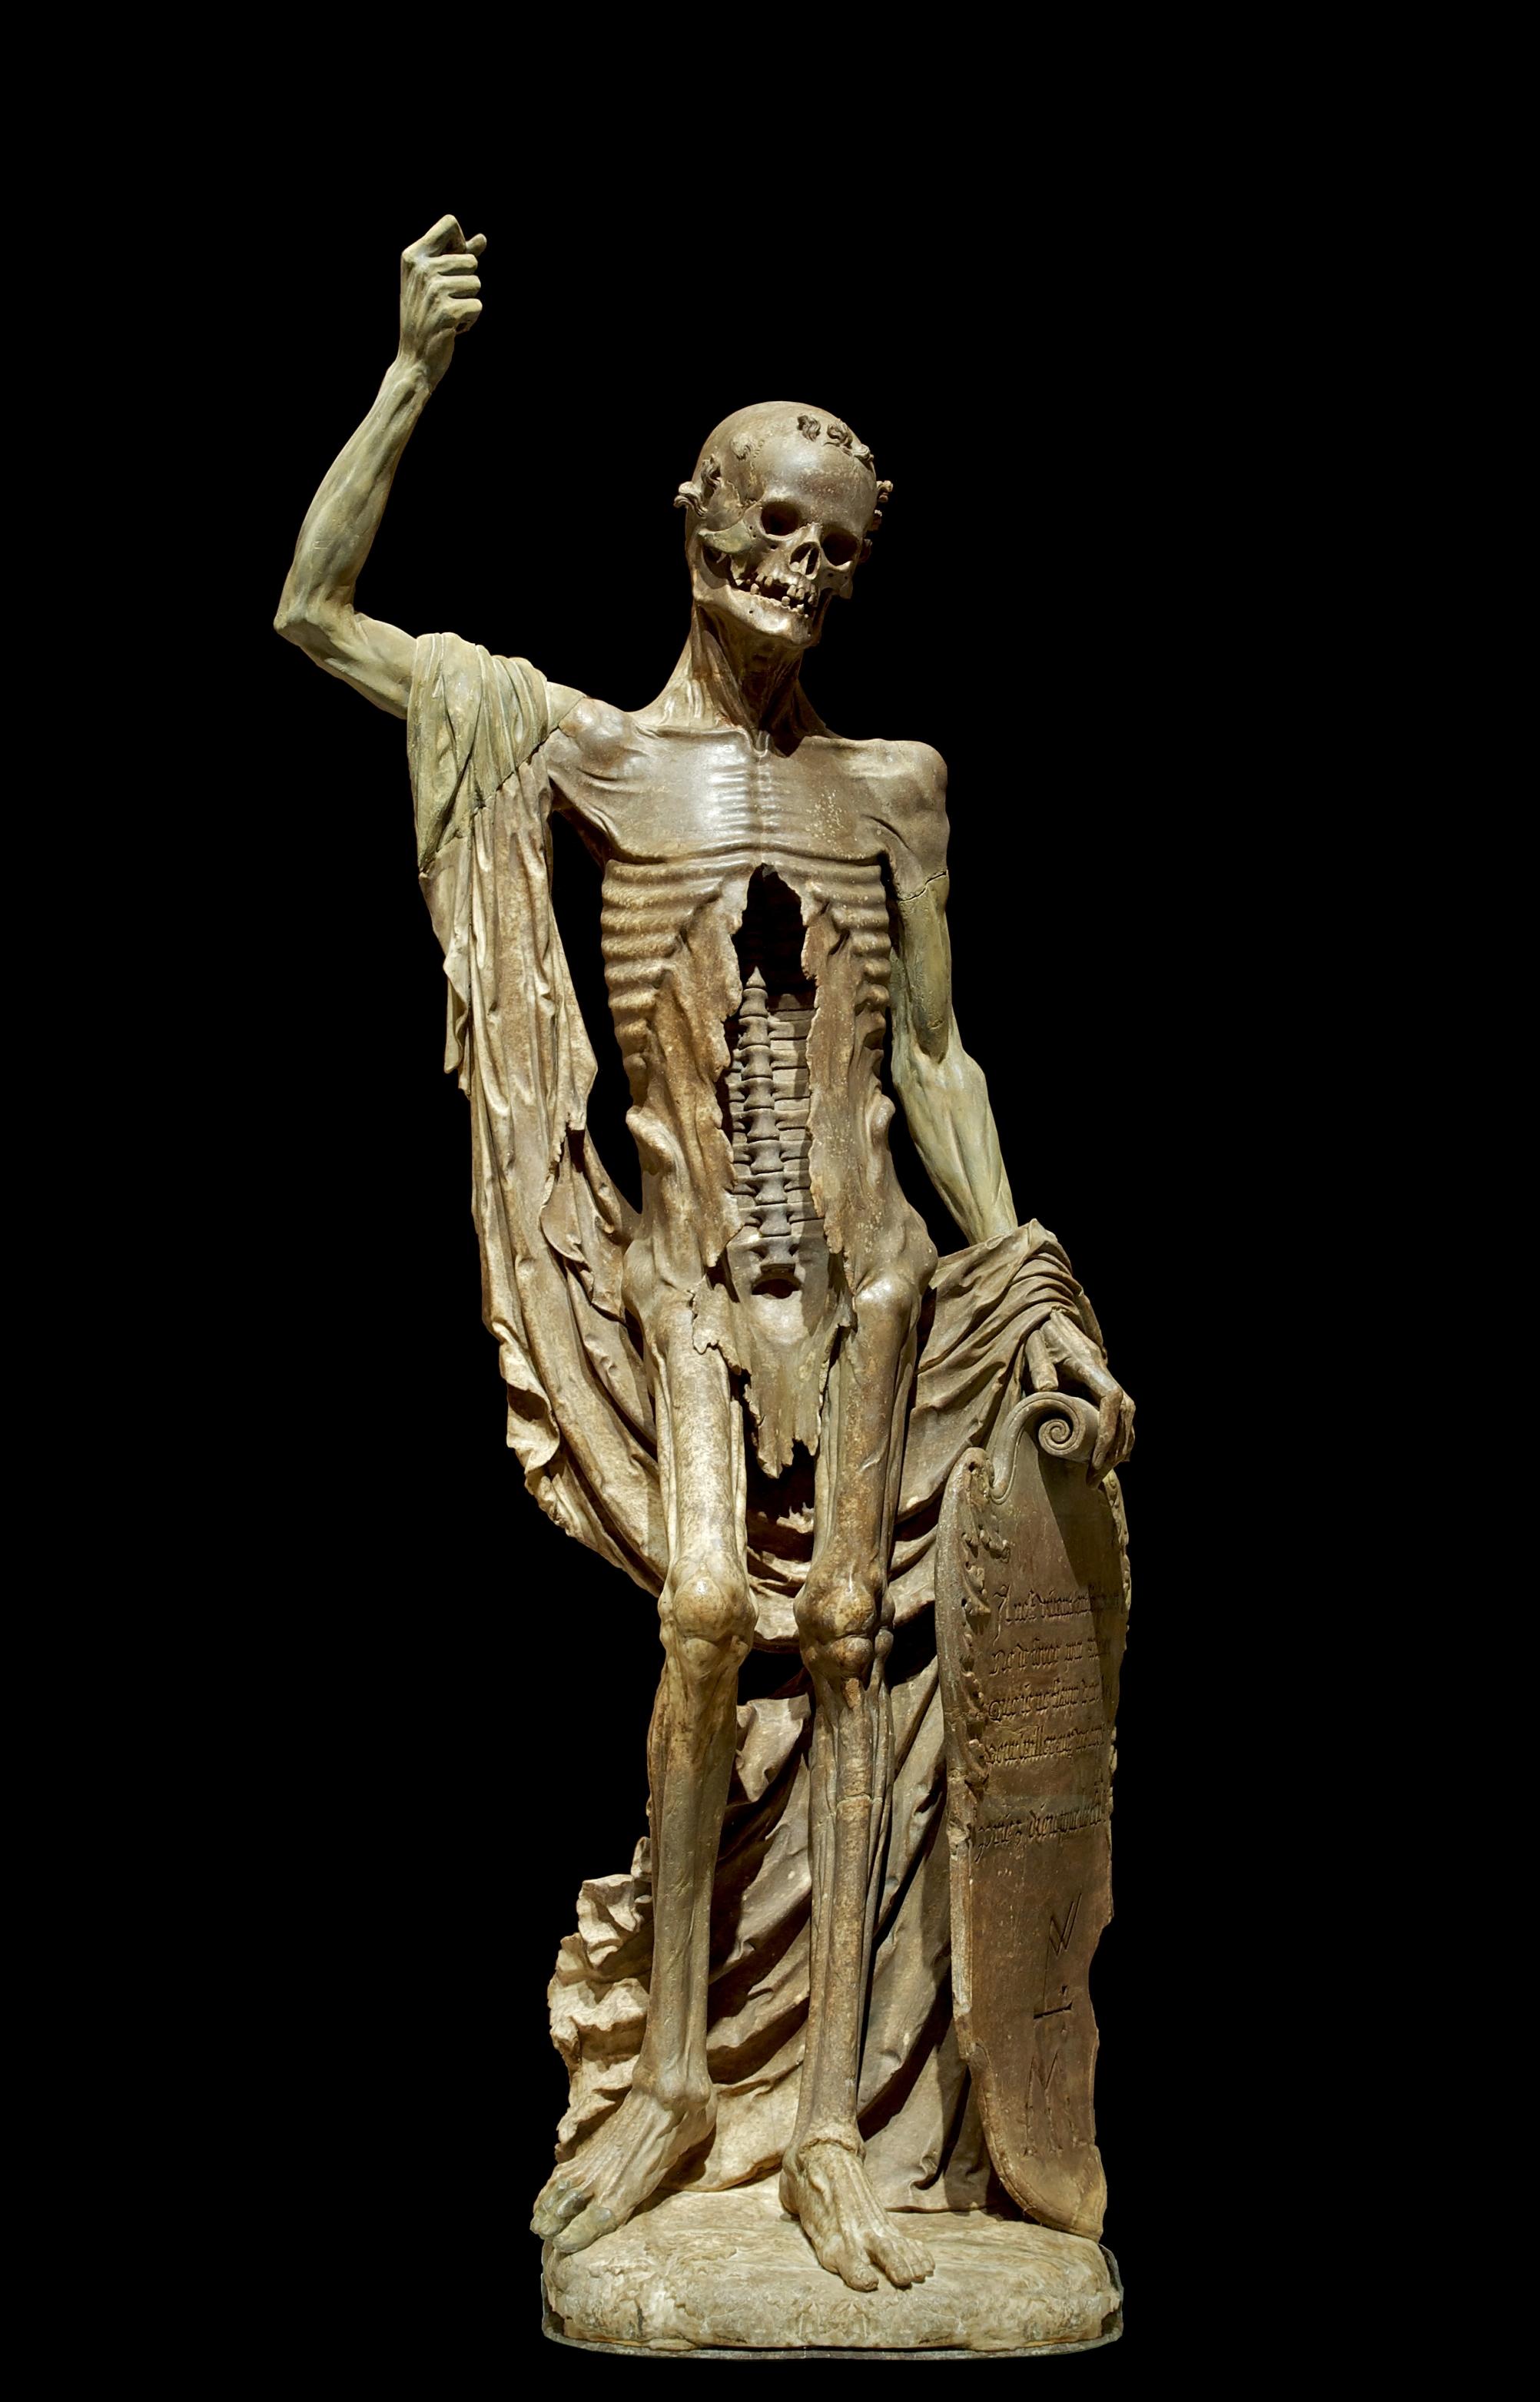 La_mort_Saint-Innocent_Louvre_R.F.2625.j